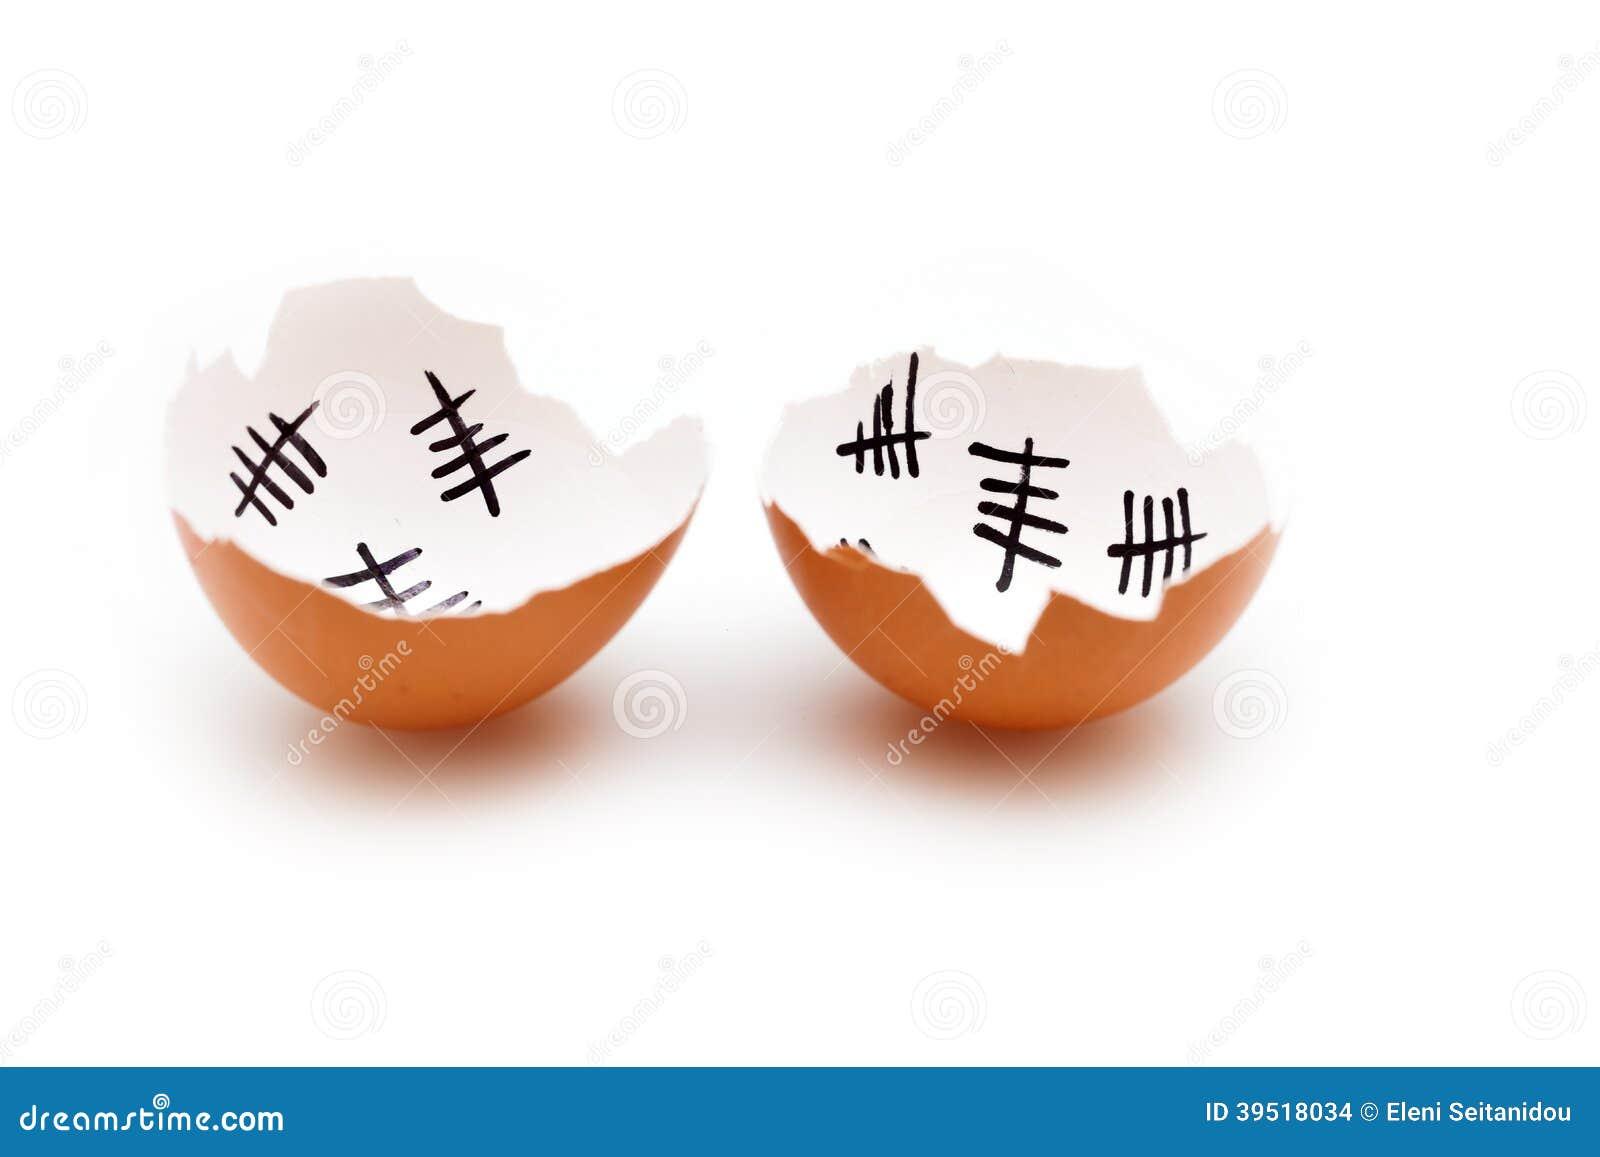 how to make egg shells white